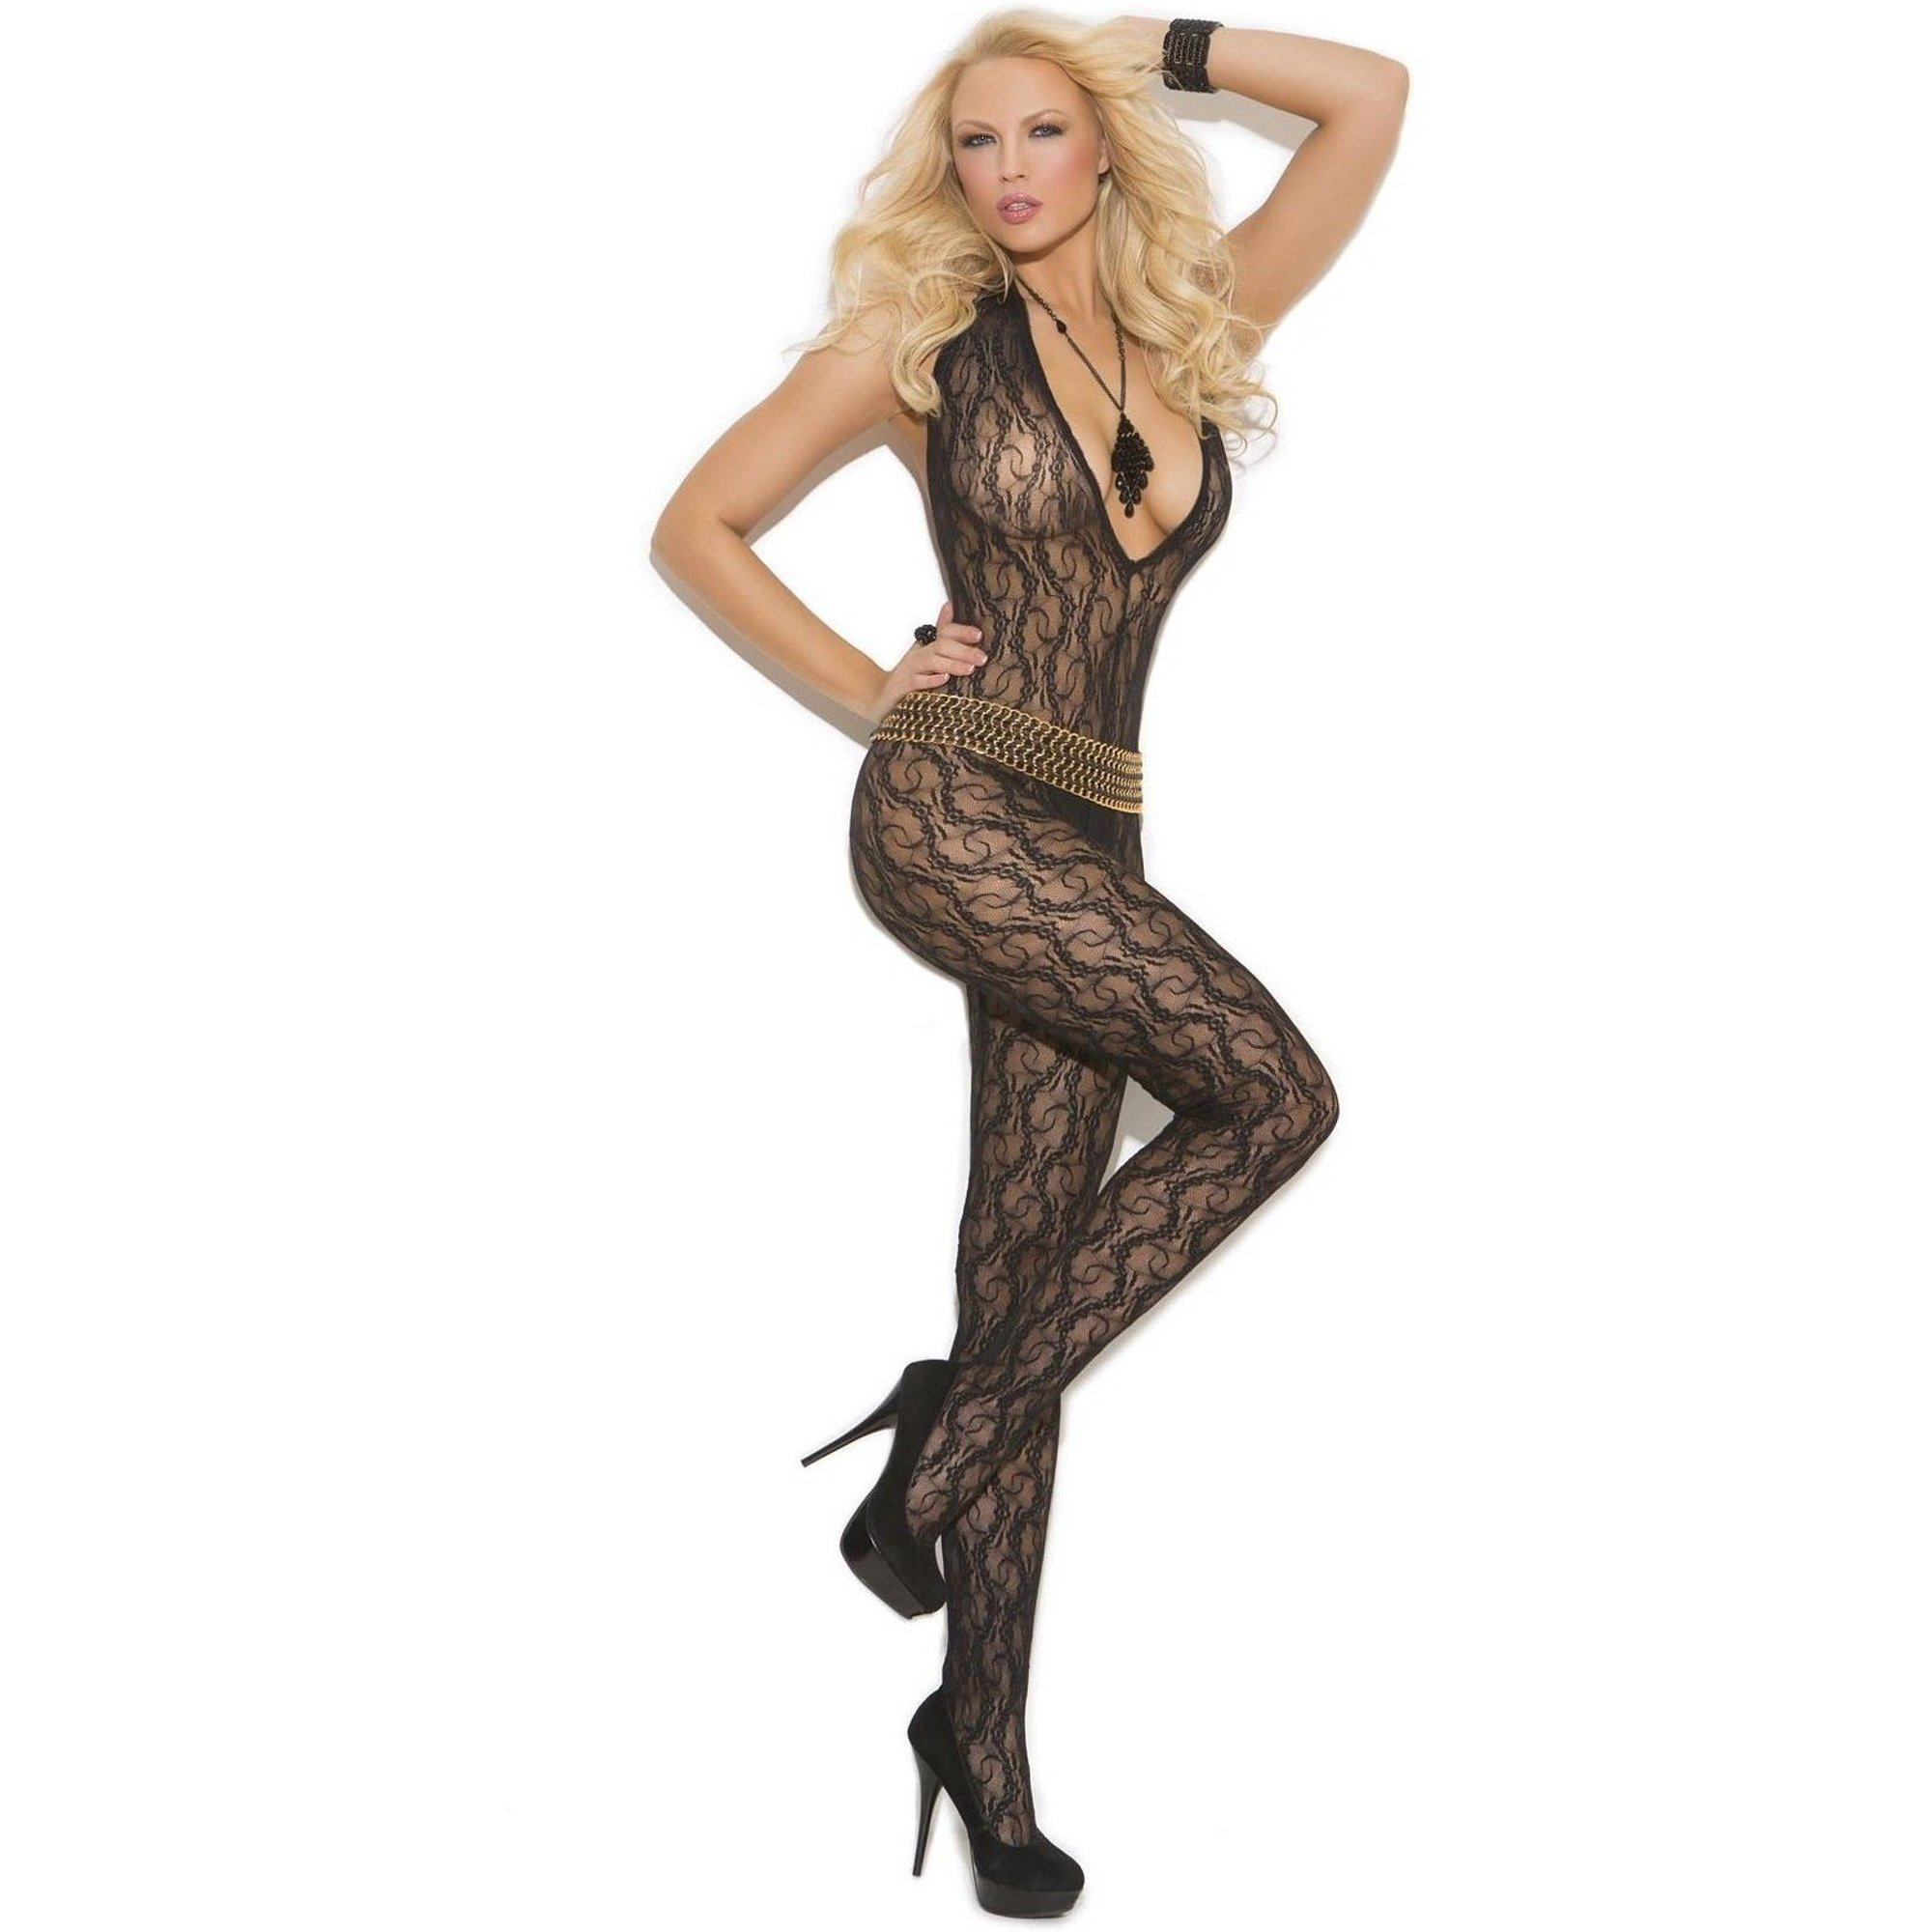 cbafad9bd Elegant Moments EM-1608 Deep V Lace Bodystocking with Open Crotch Black    O S